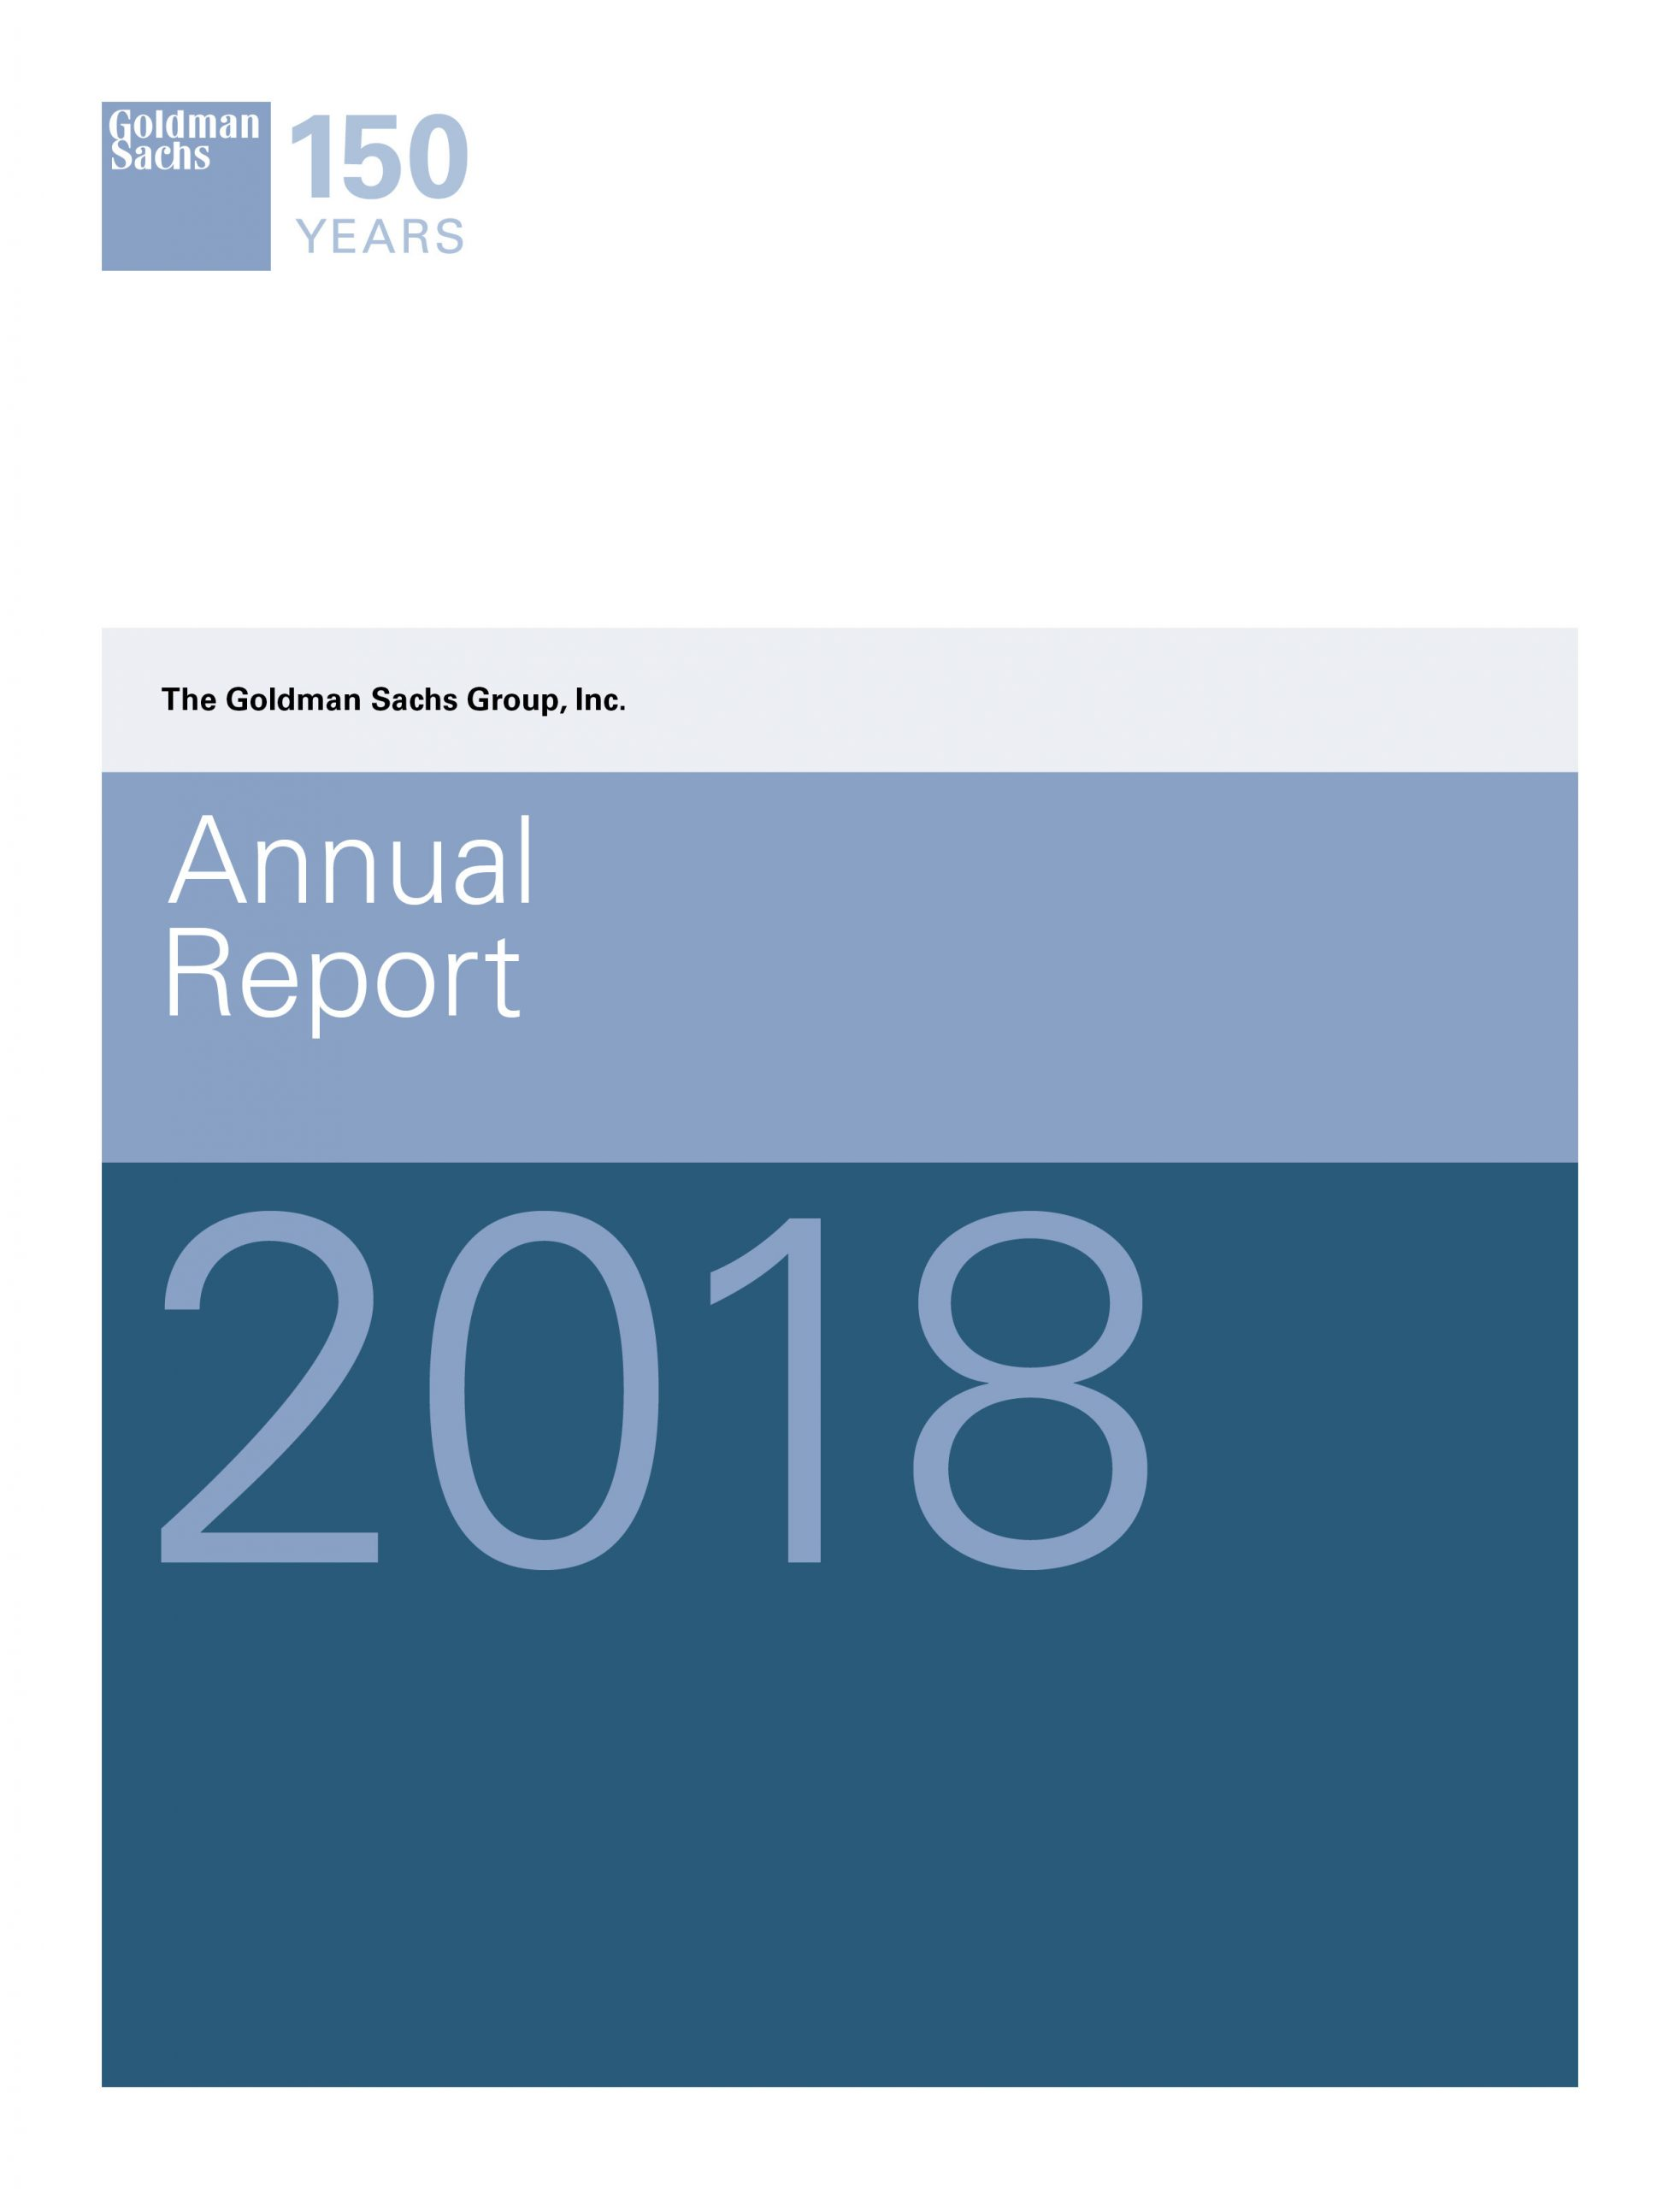 Goldman Sachs 2018 Annual Report pour Planning Annuel 2018